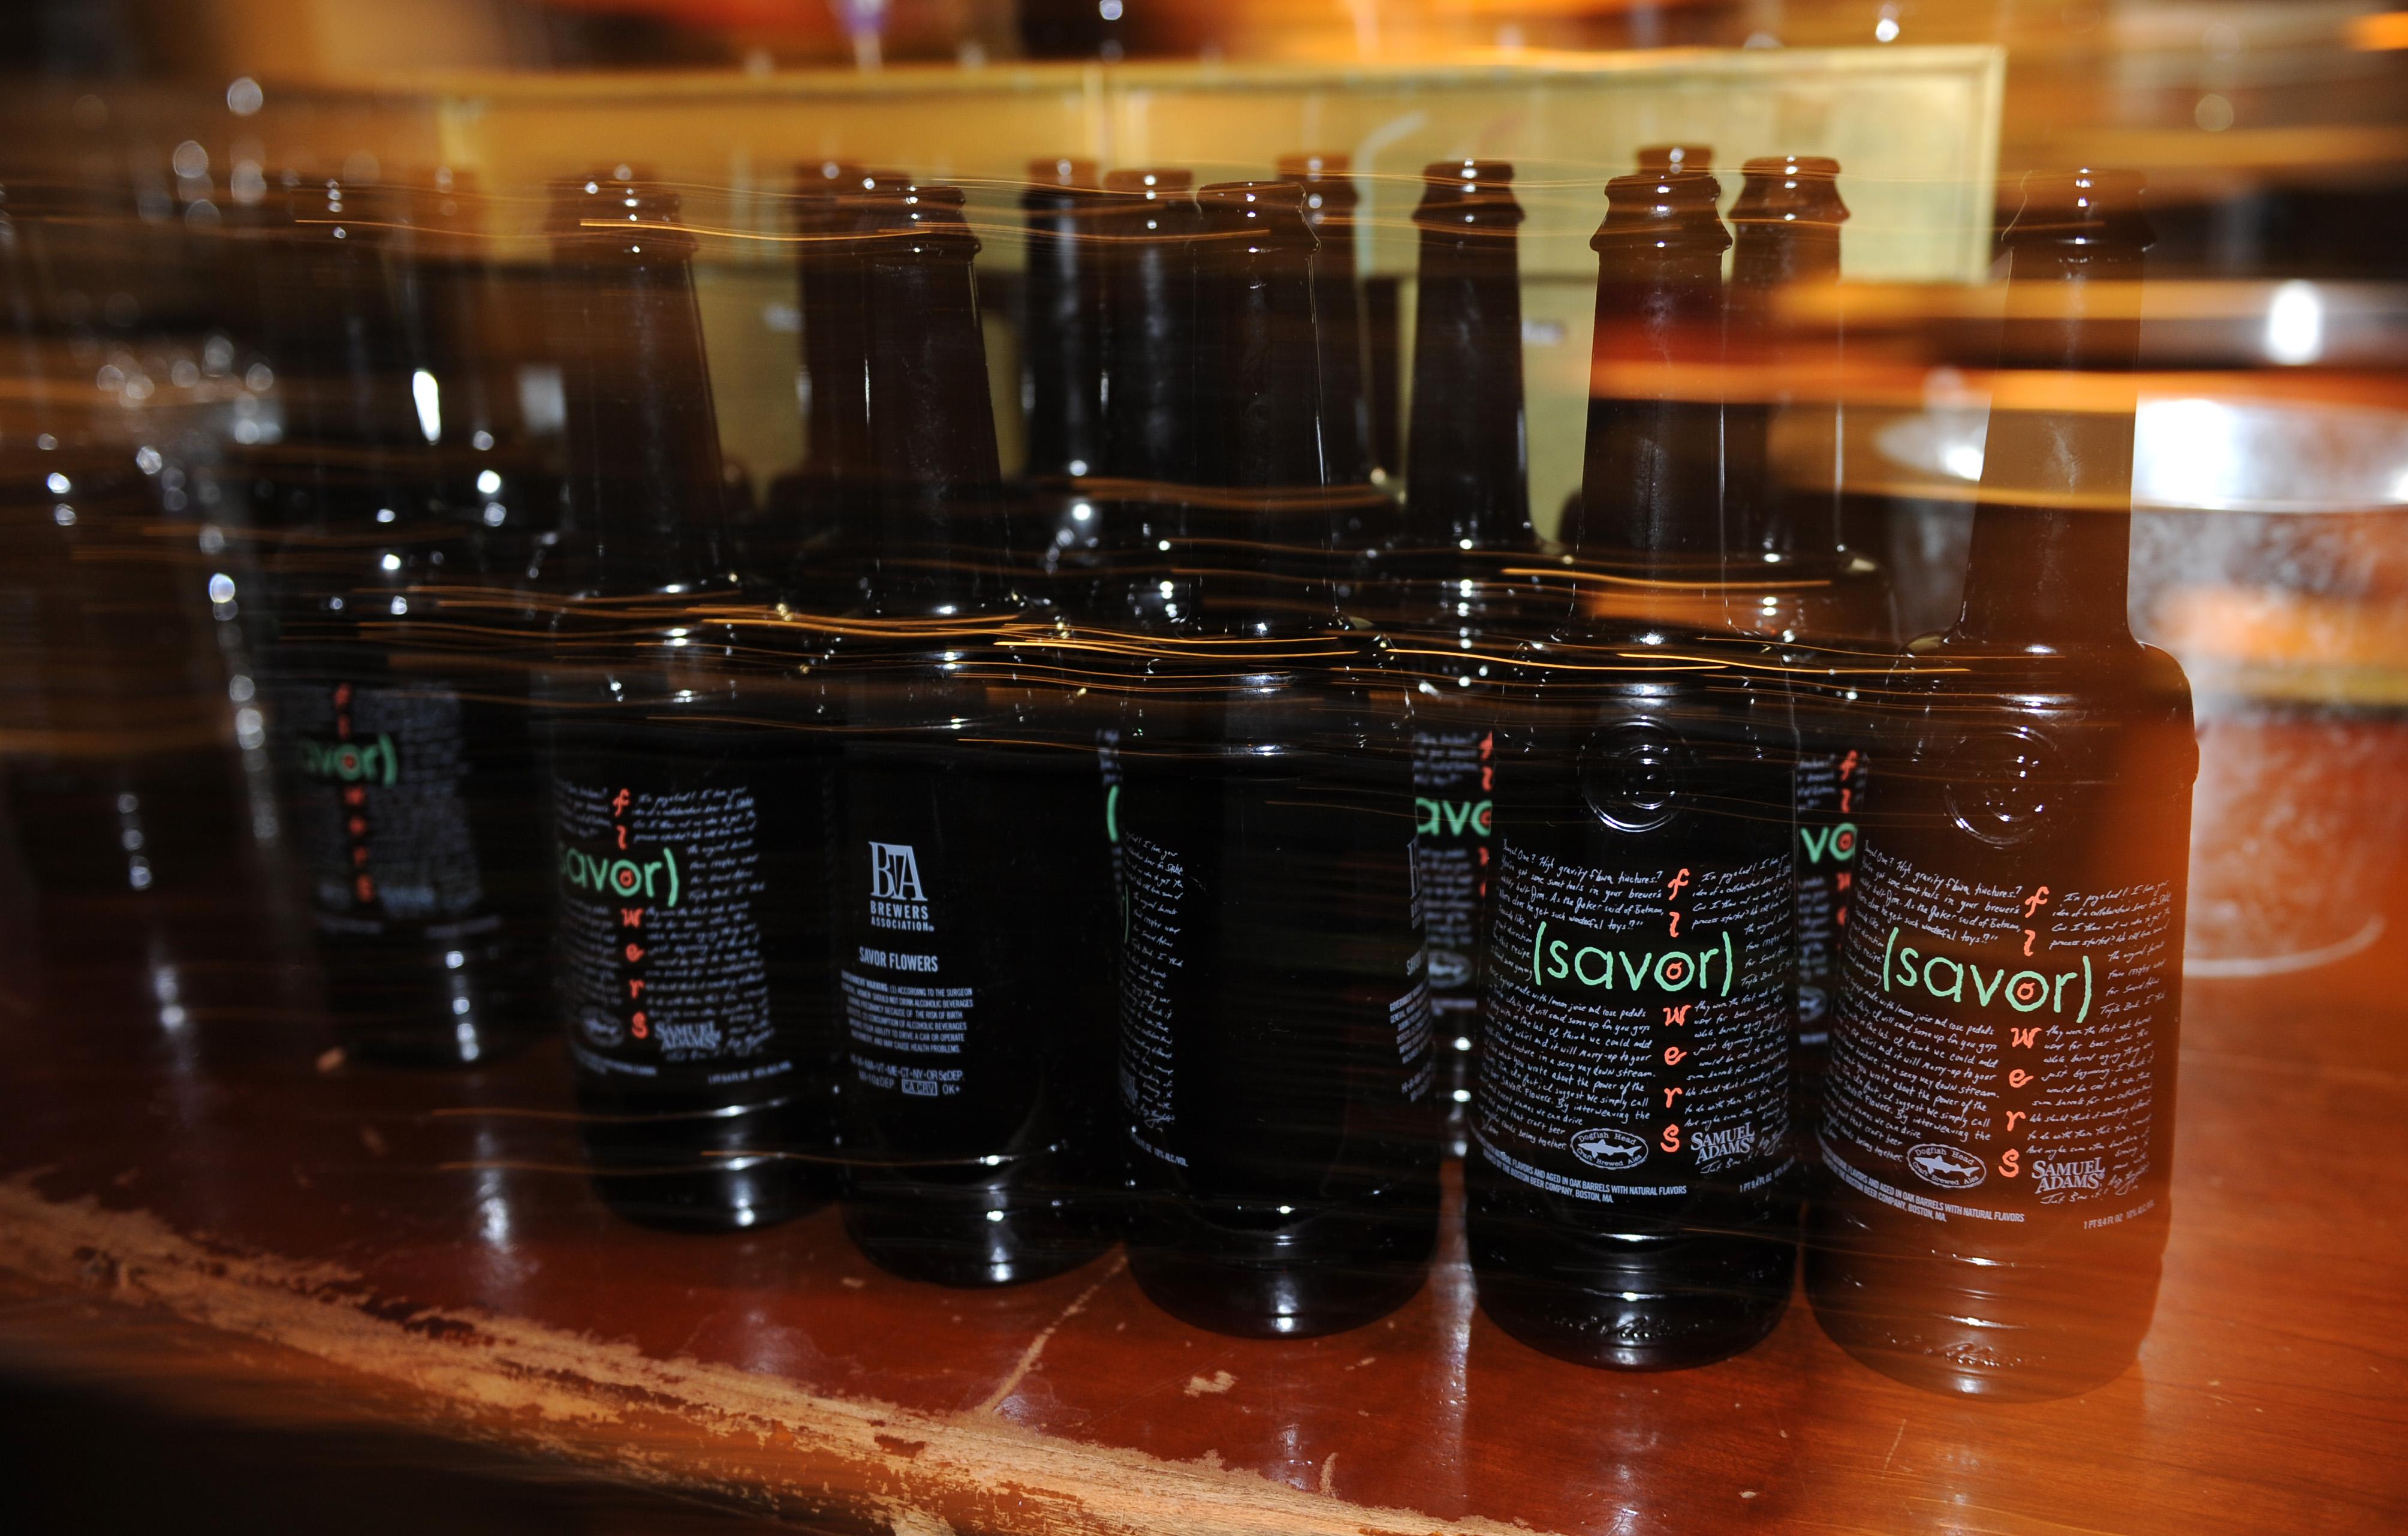 Craft breweries descend on D.C. for SAVOR